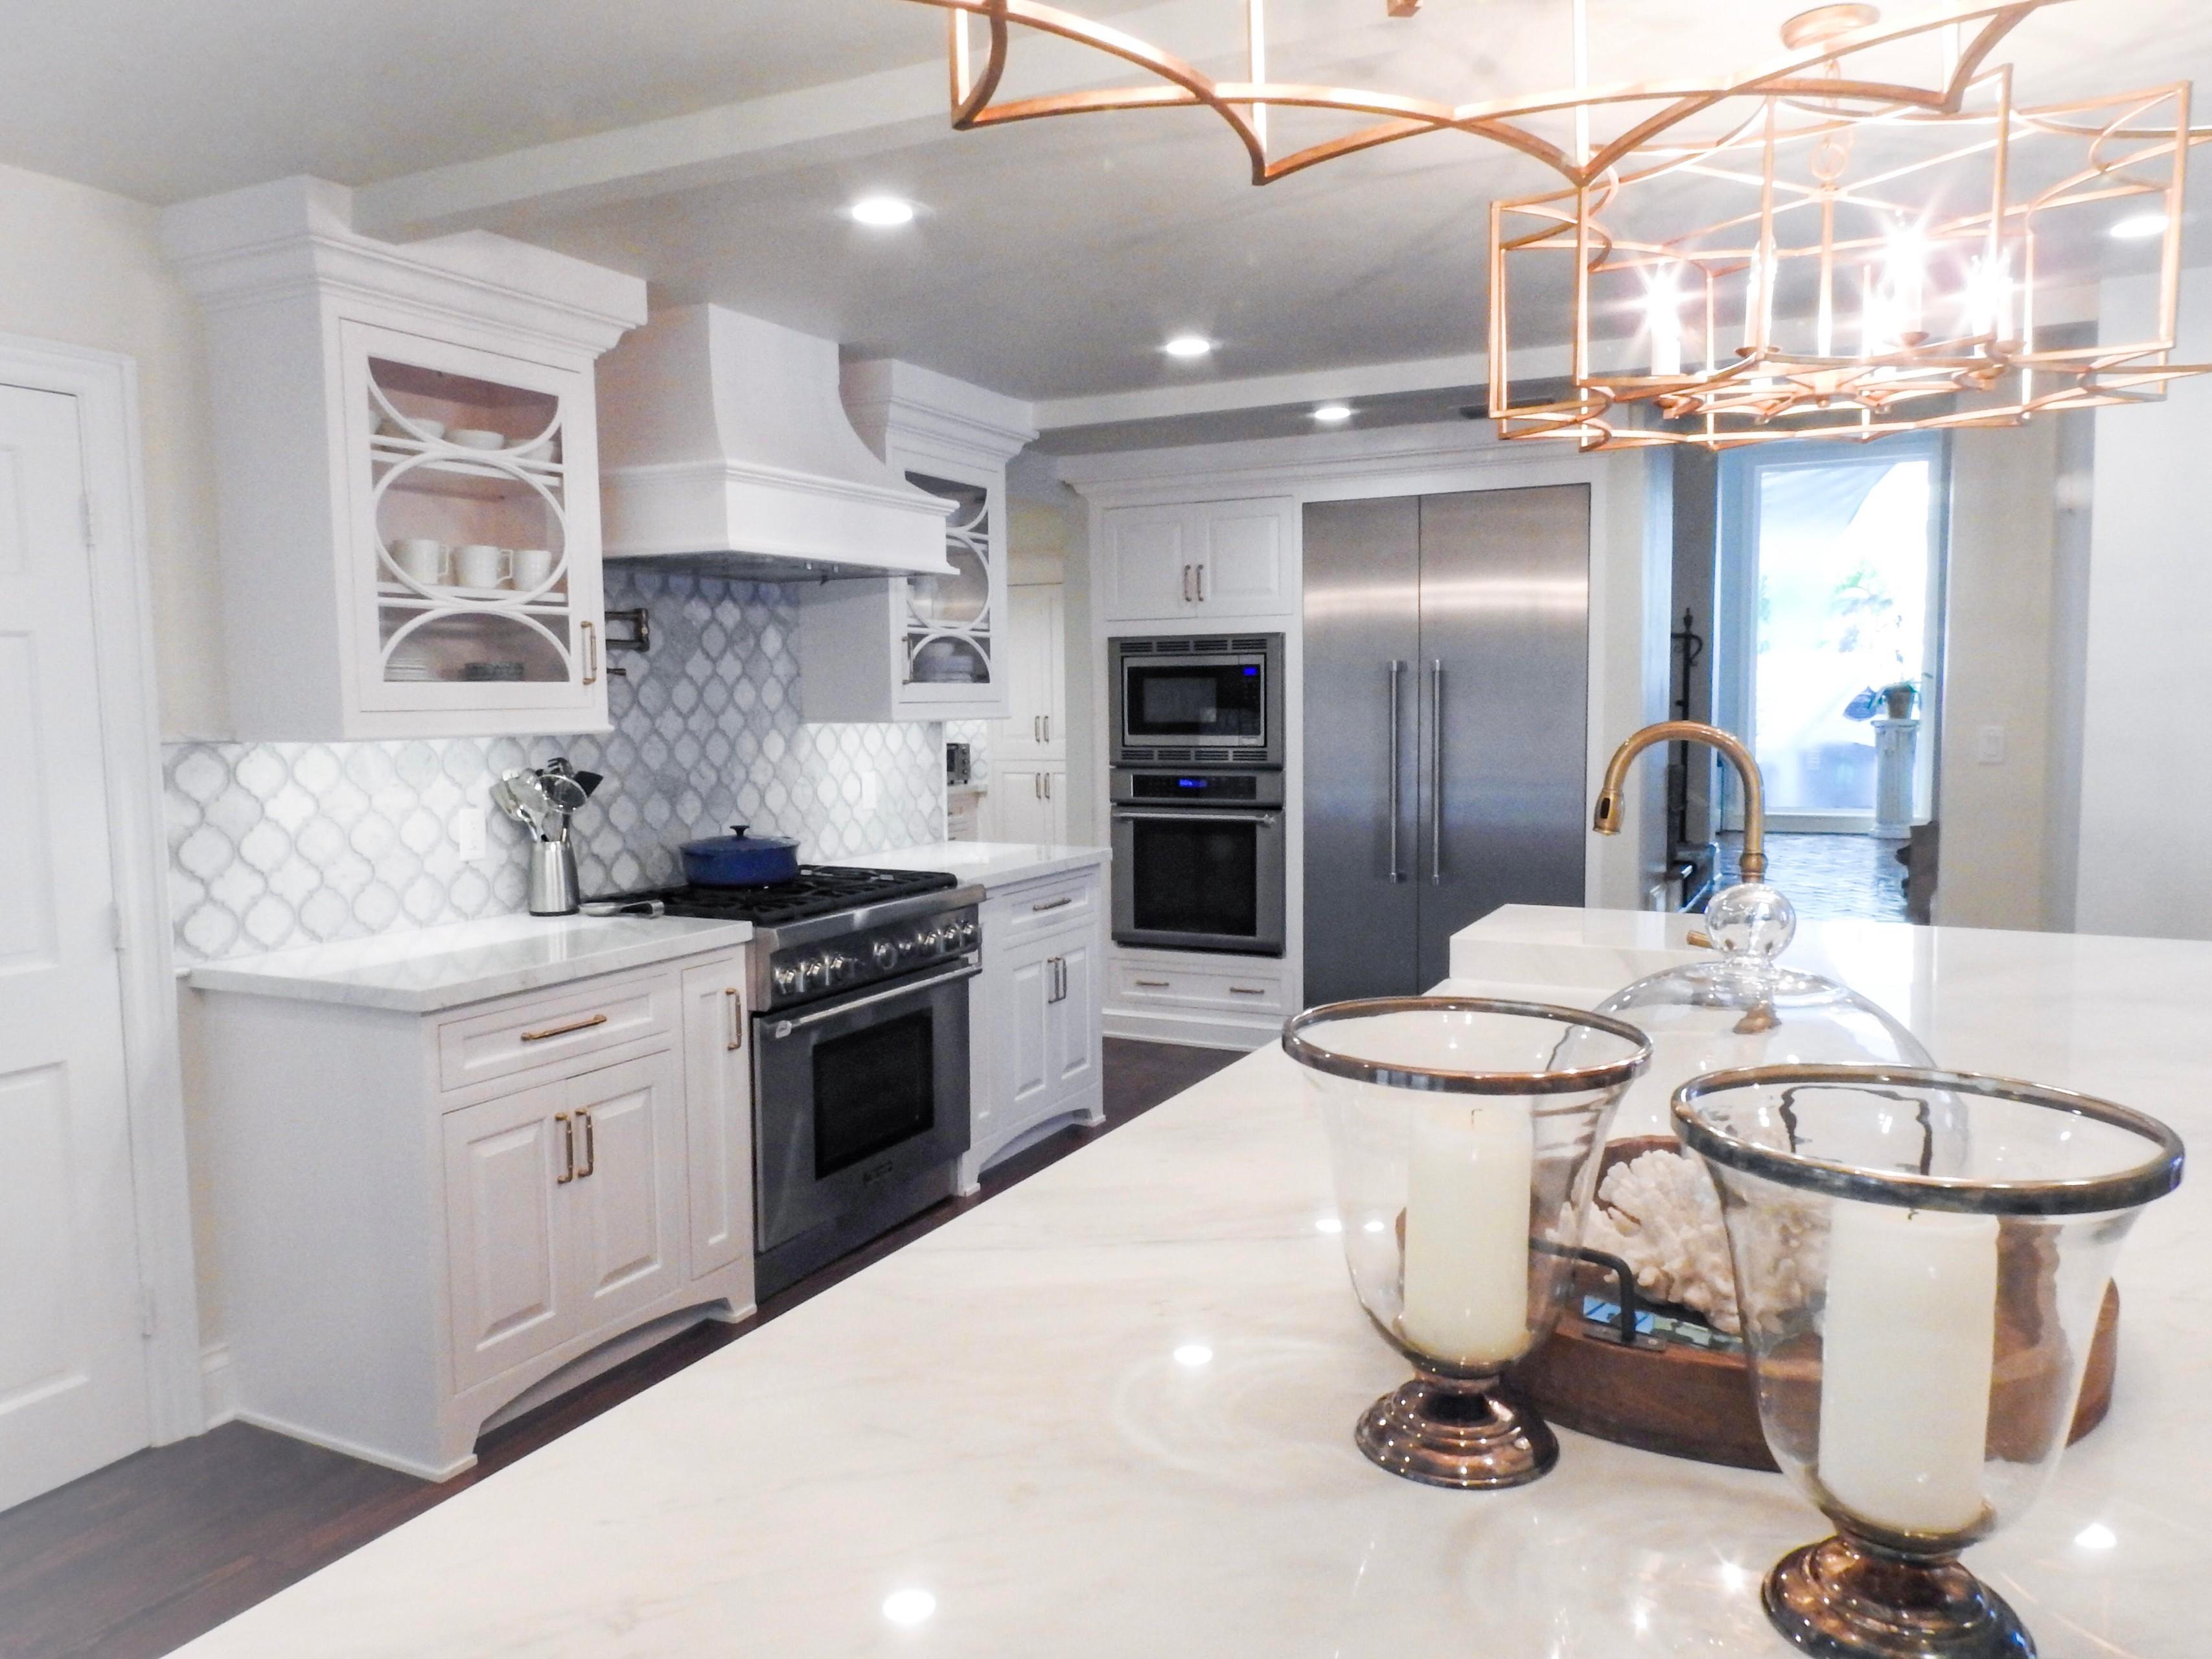 Elegant kitchen, white cabinets by Amoroso Cabinets, center island